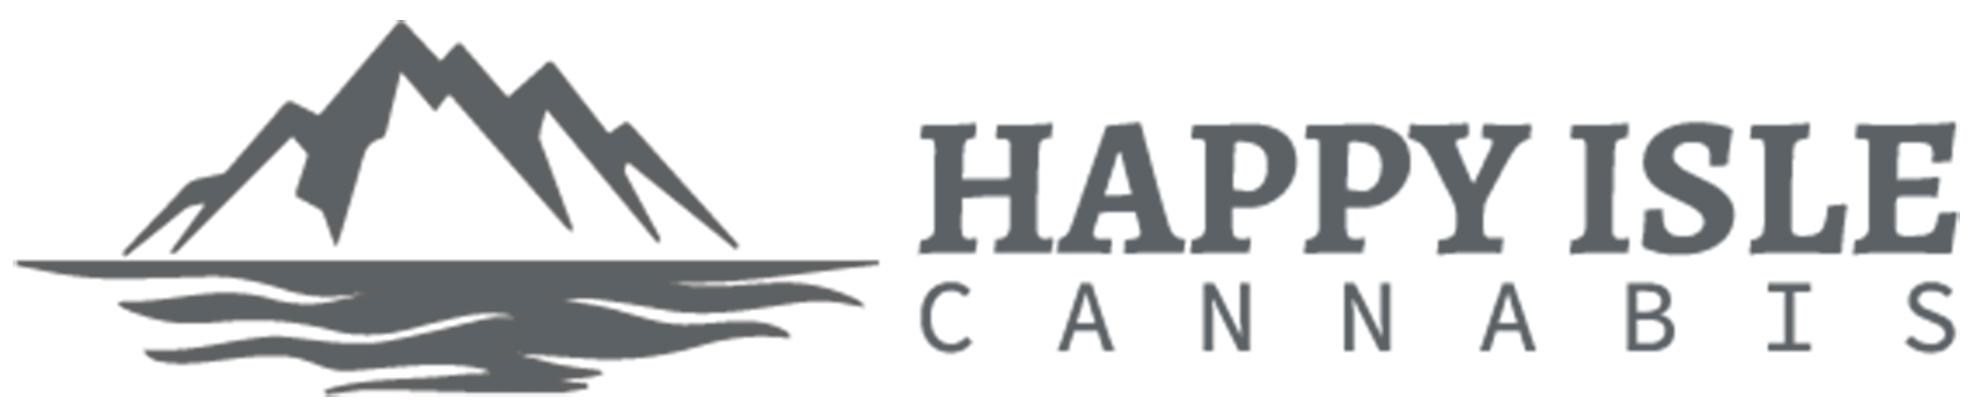 Happy Isle Cannabis logo